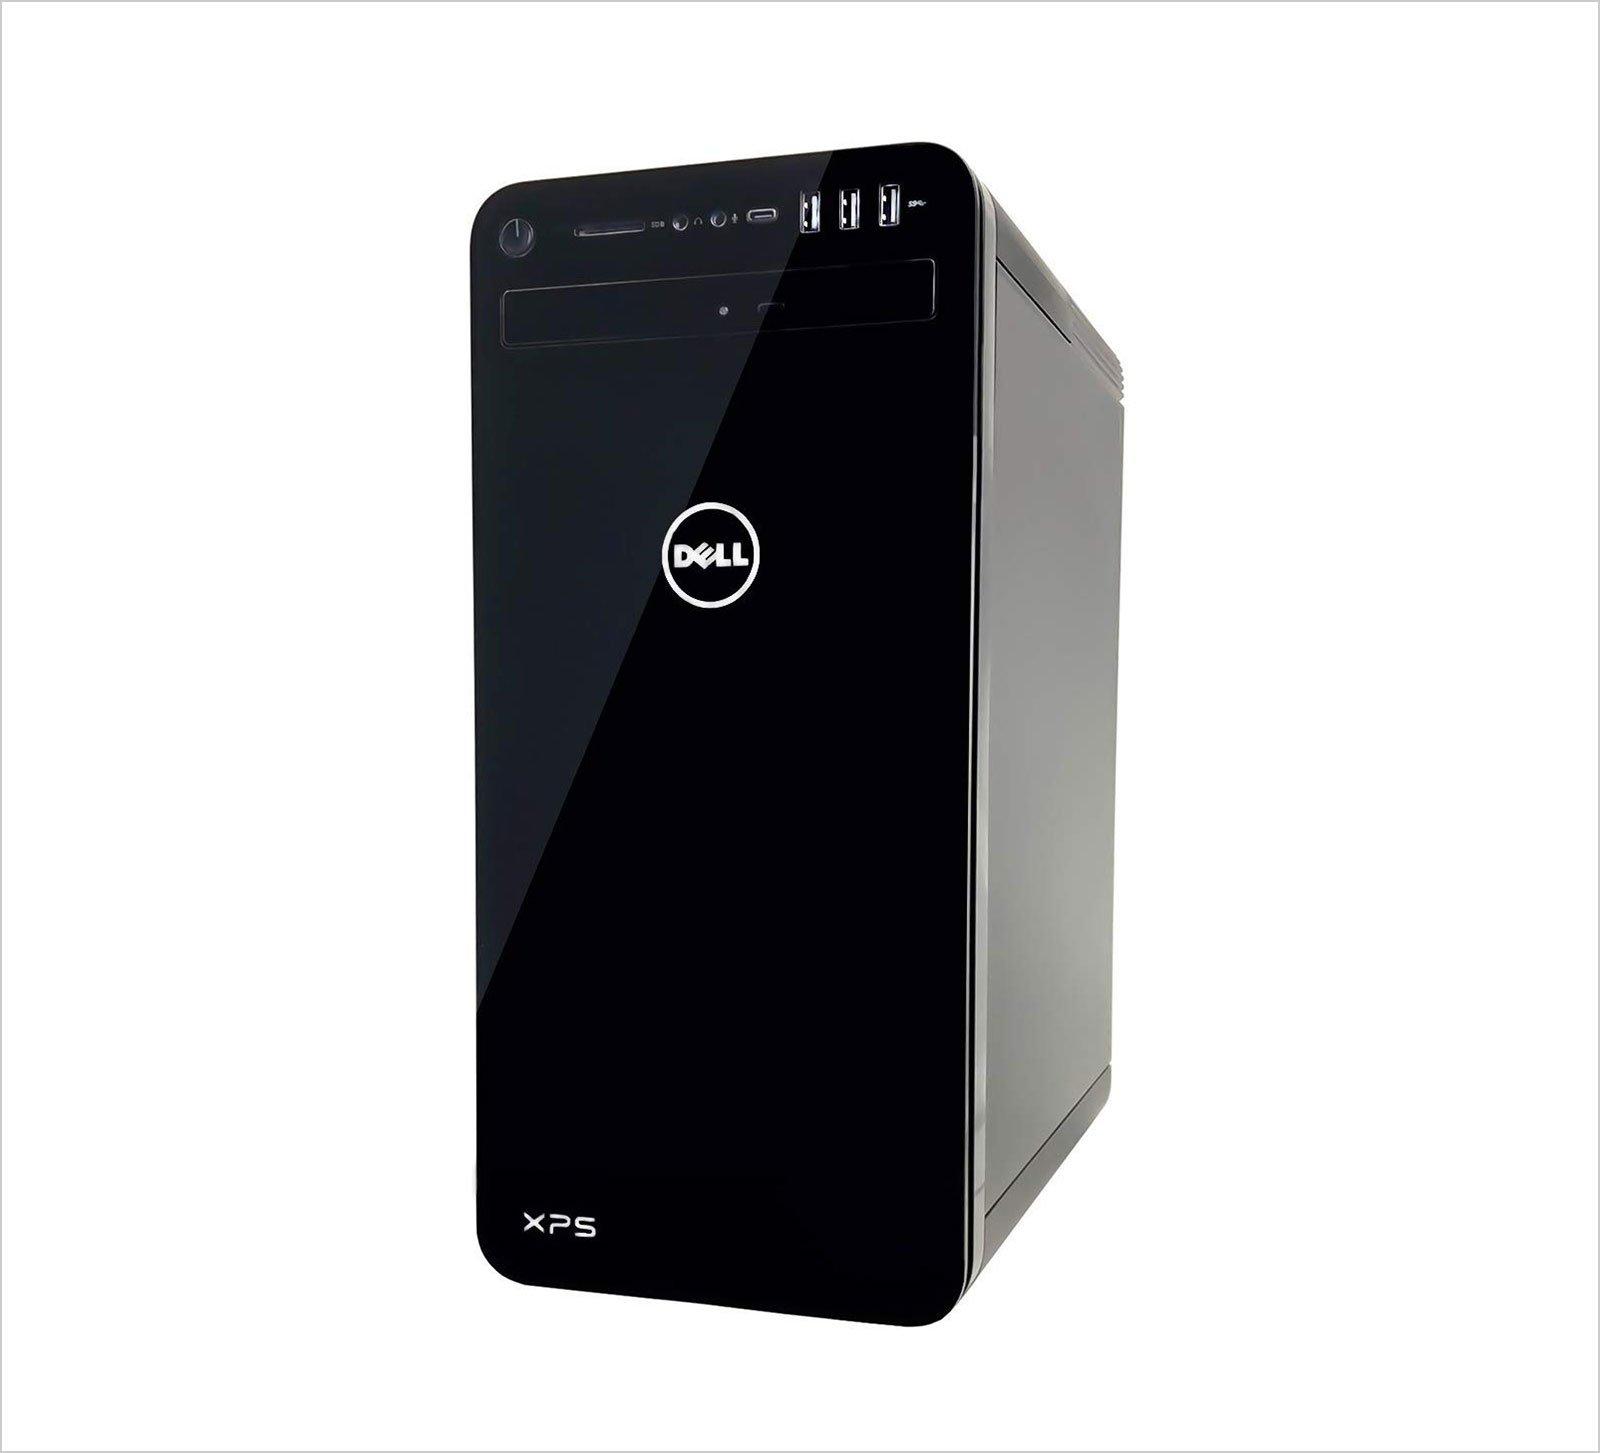 Dell-XPS-8930-Tower-Desktop---8th-Gen